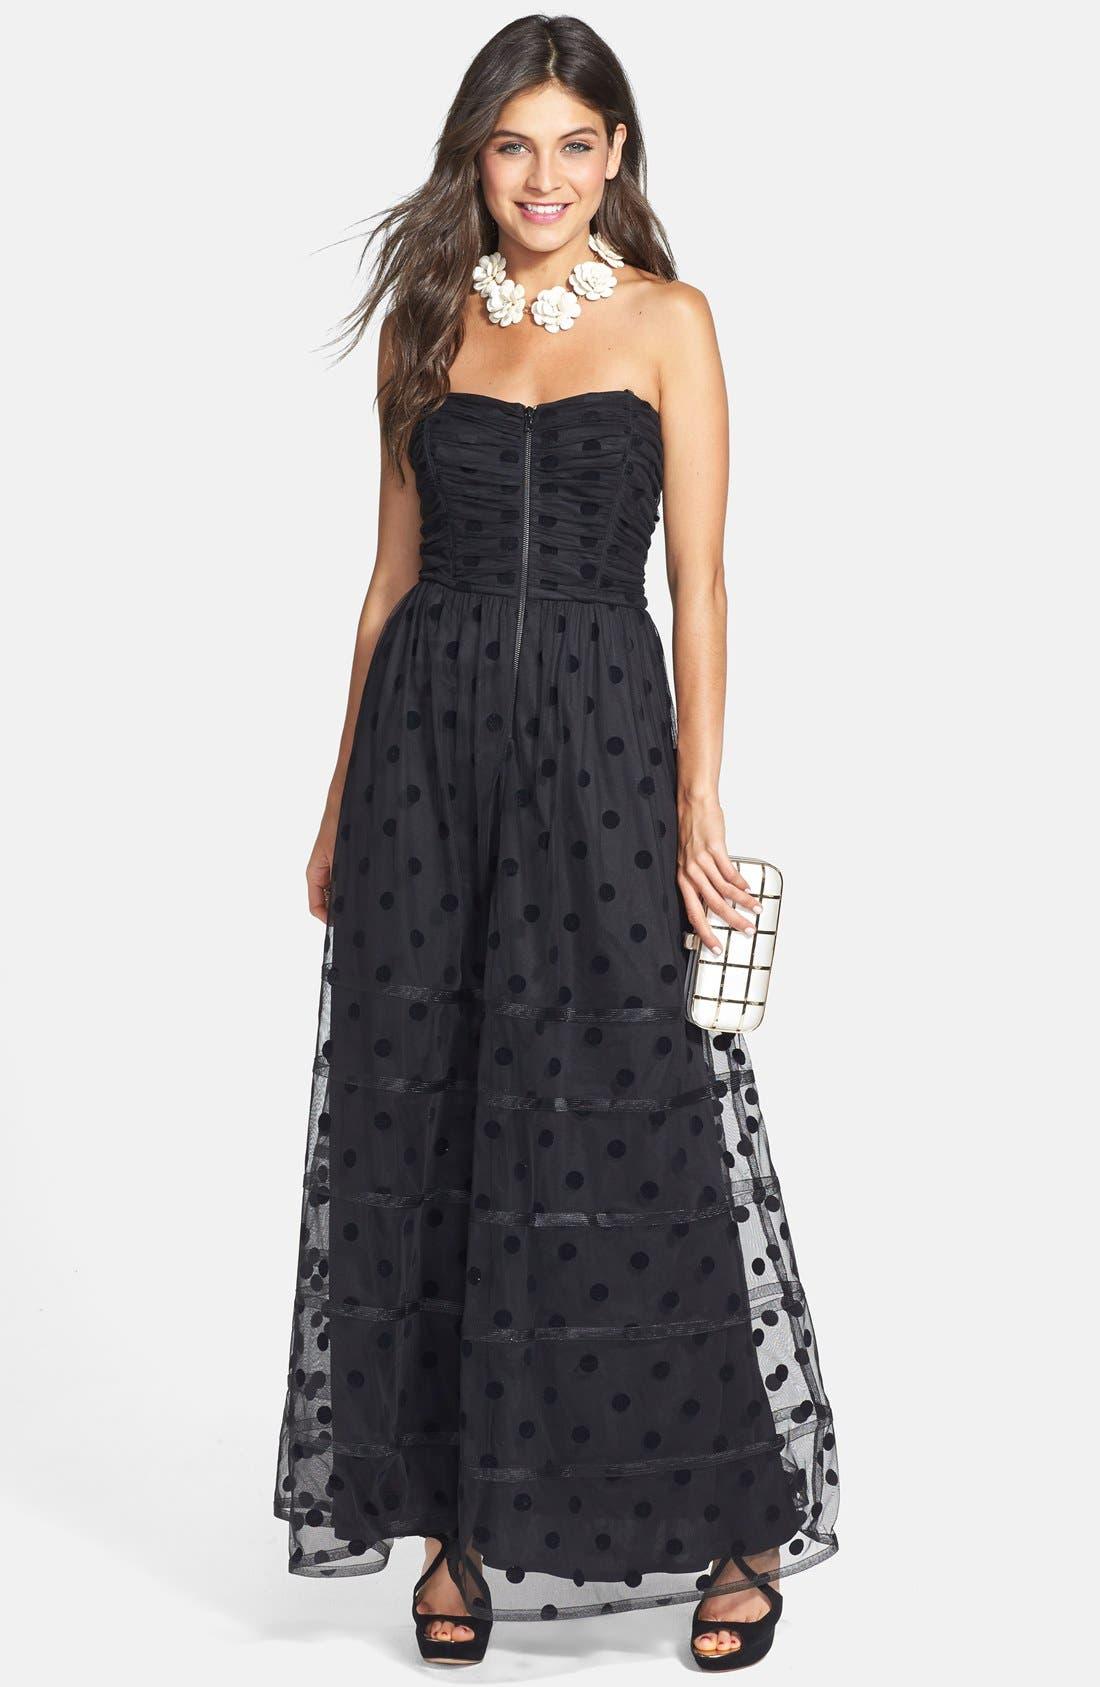 Main Image - Betsey Johnson Polka Dot Mesh Gown